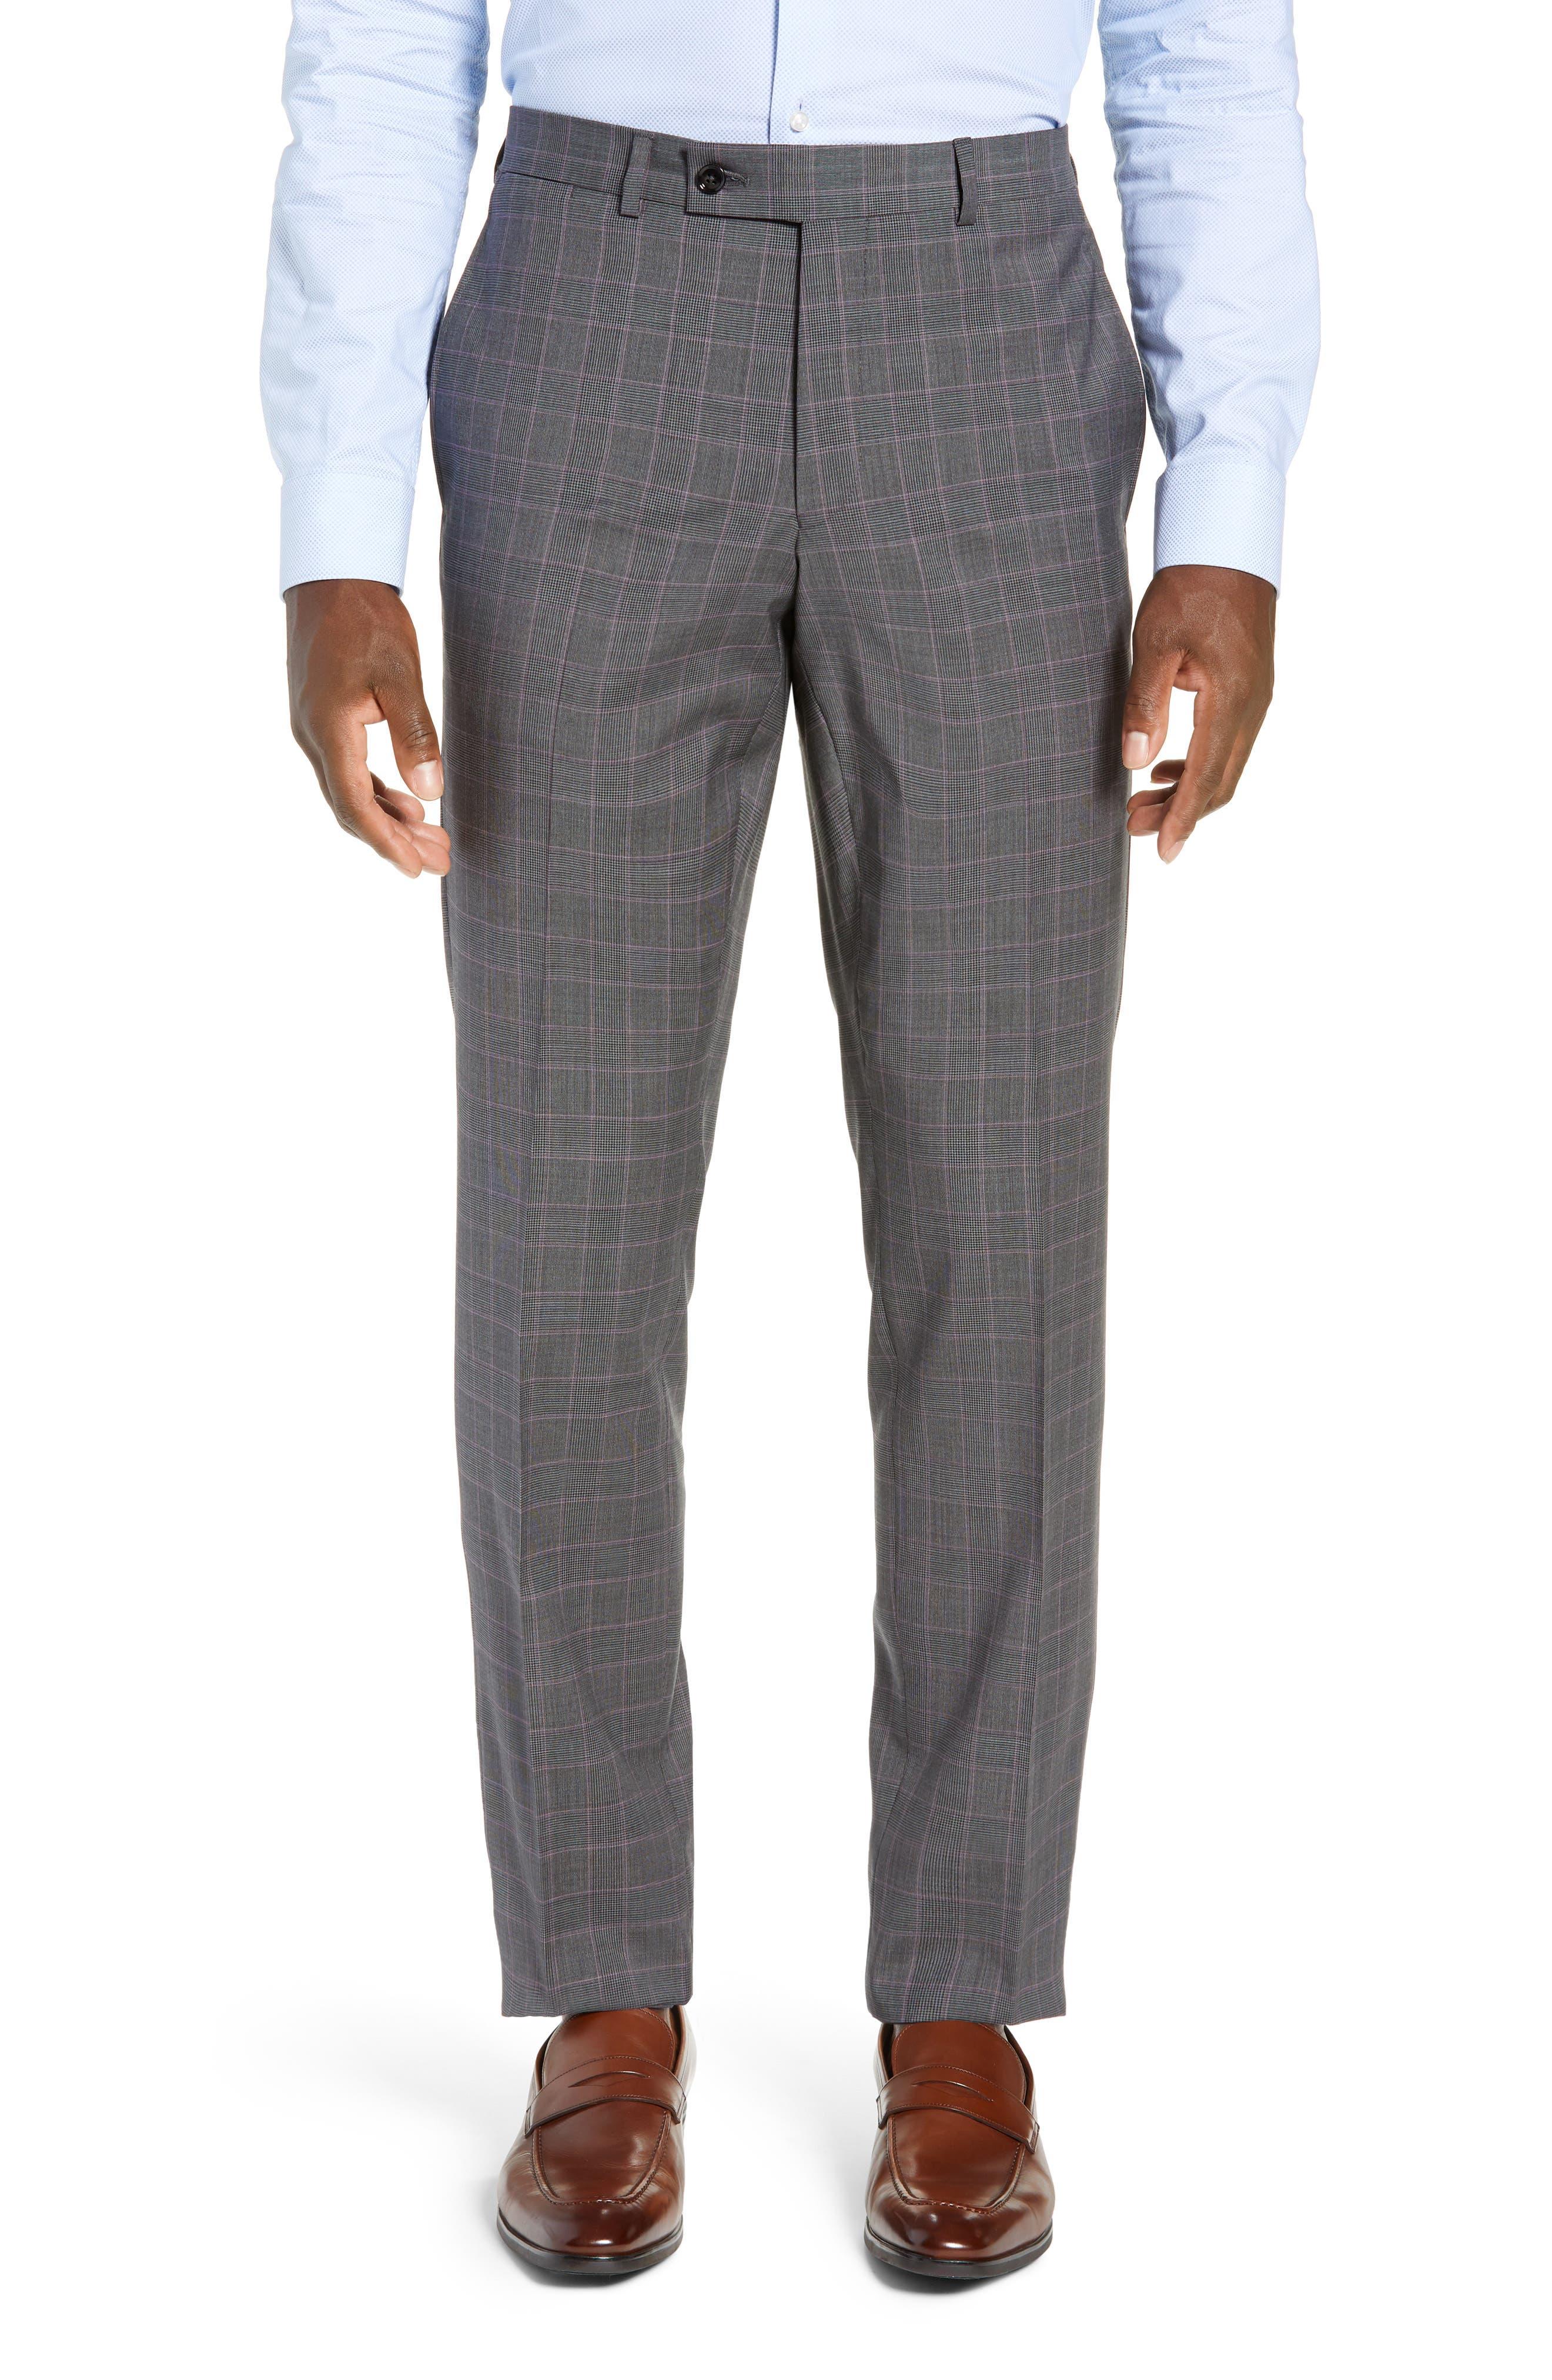 TED BAKER LONDON,                             Jay Trim Fit Plaid Wool Suit,                             Alternate thumbnail 6, color,                             GREY